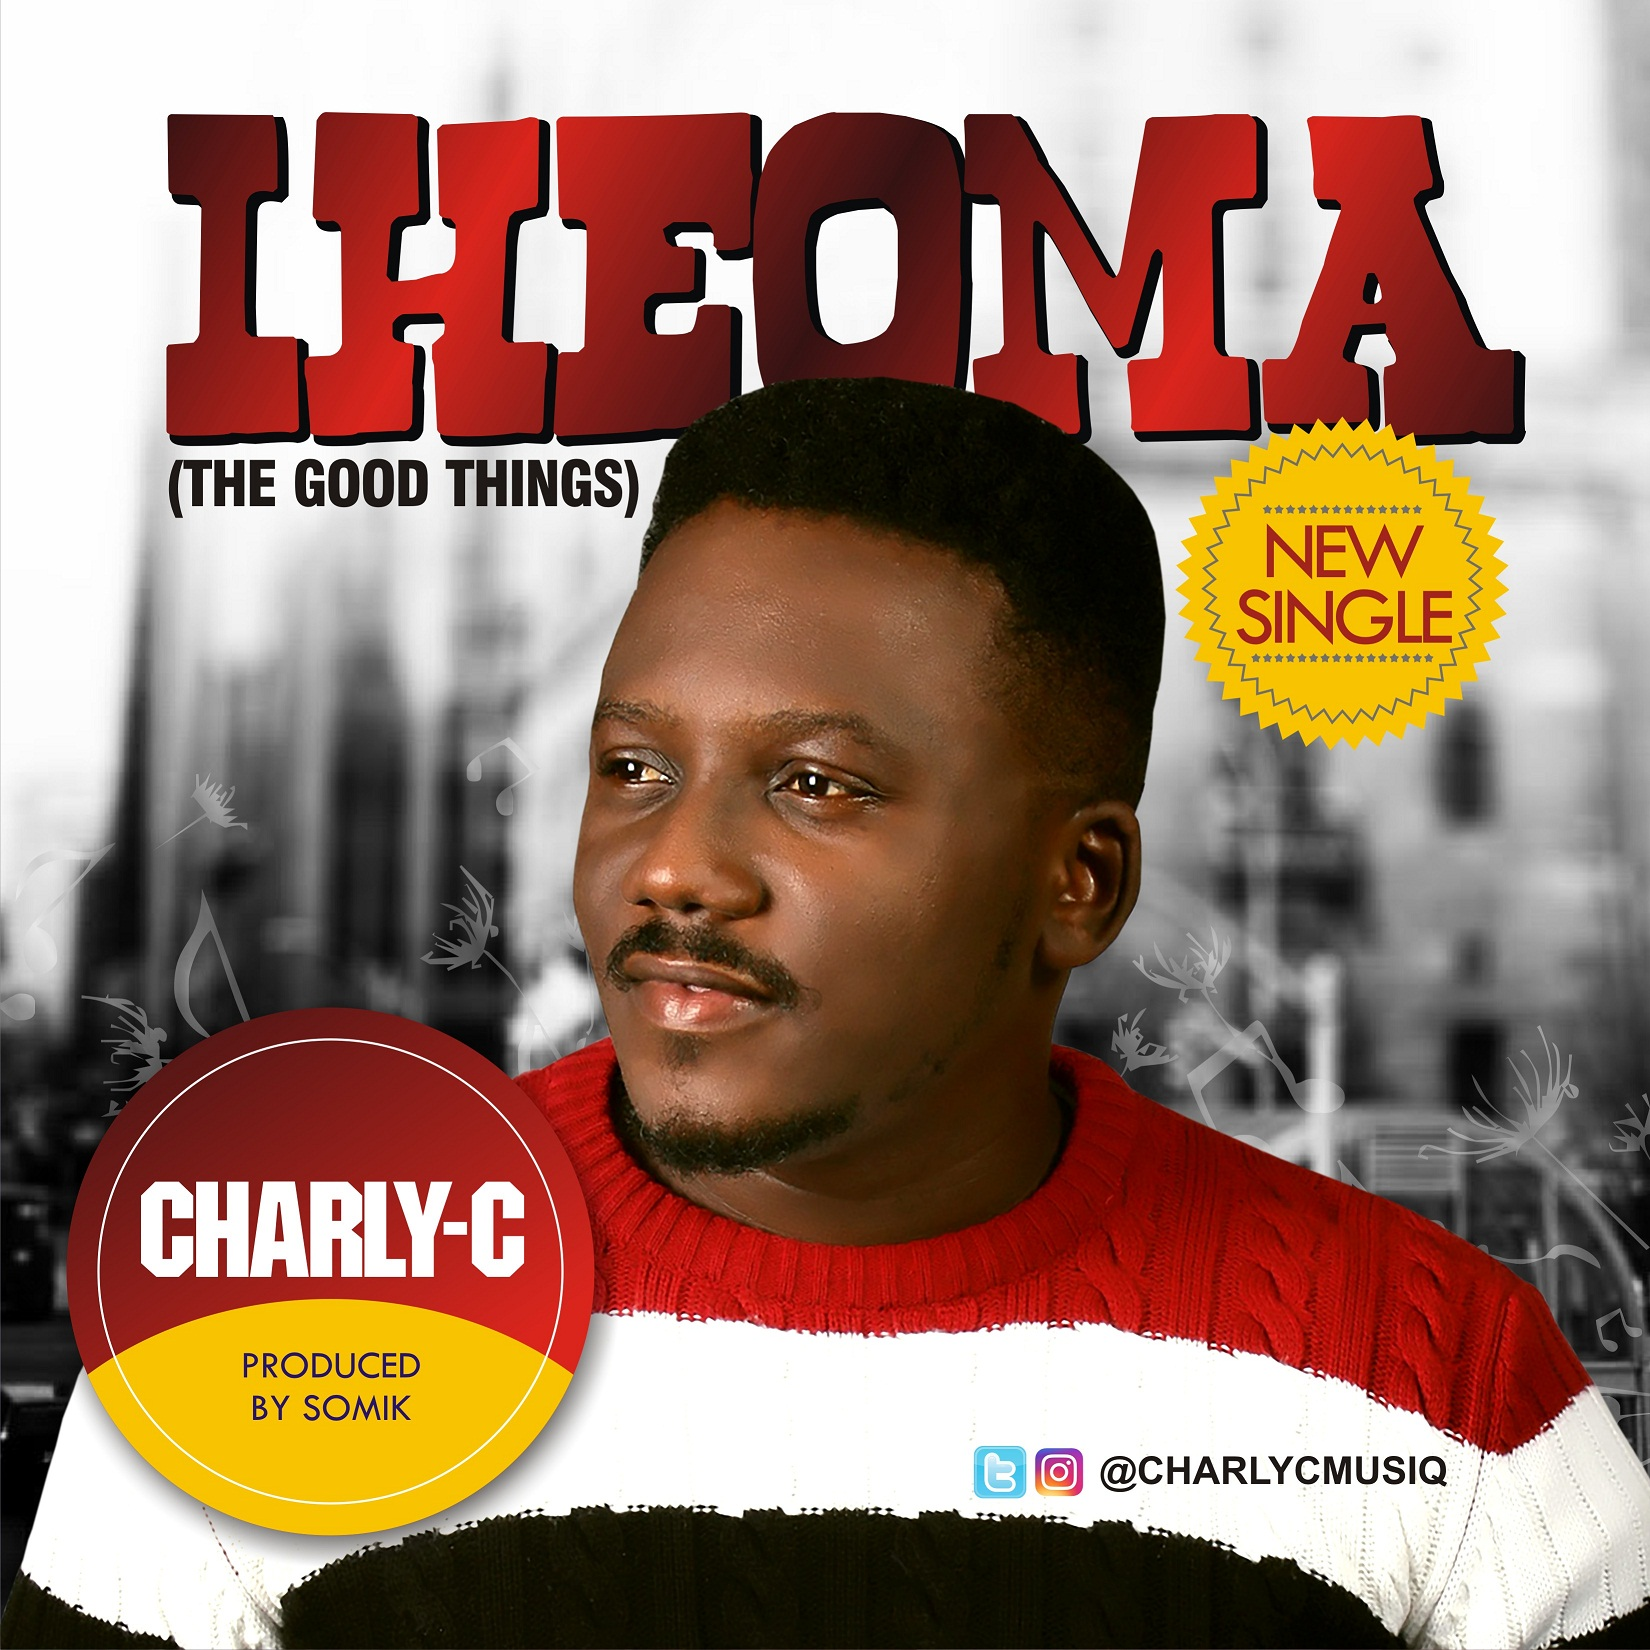 IHEOMA - Charly-C